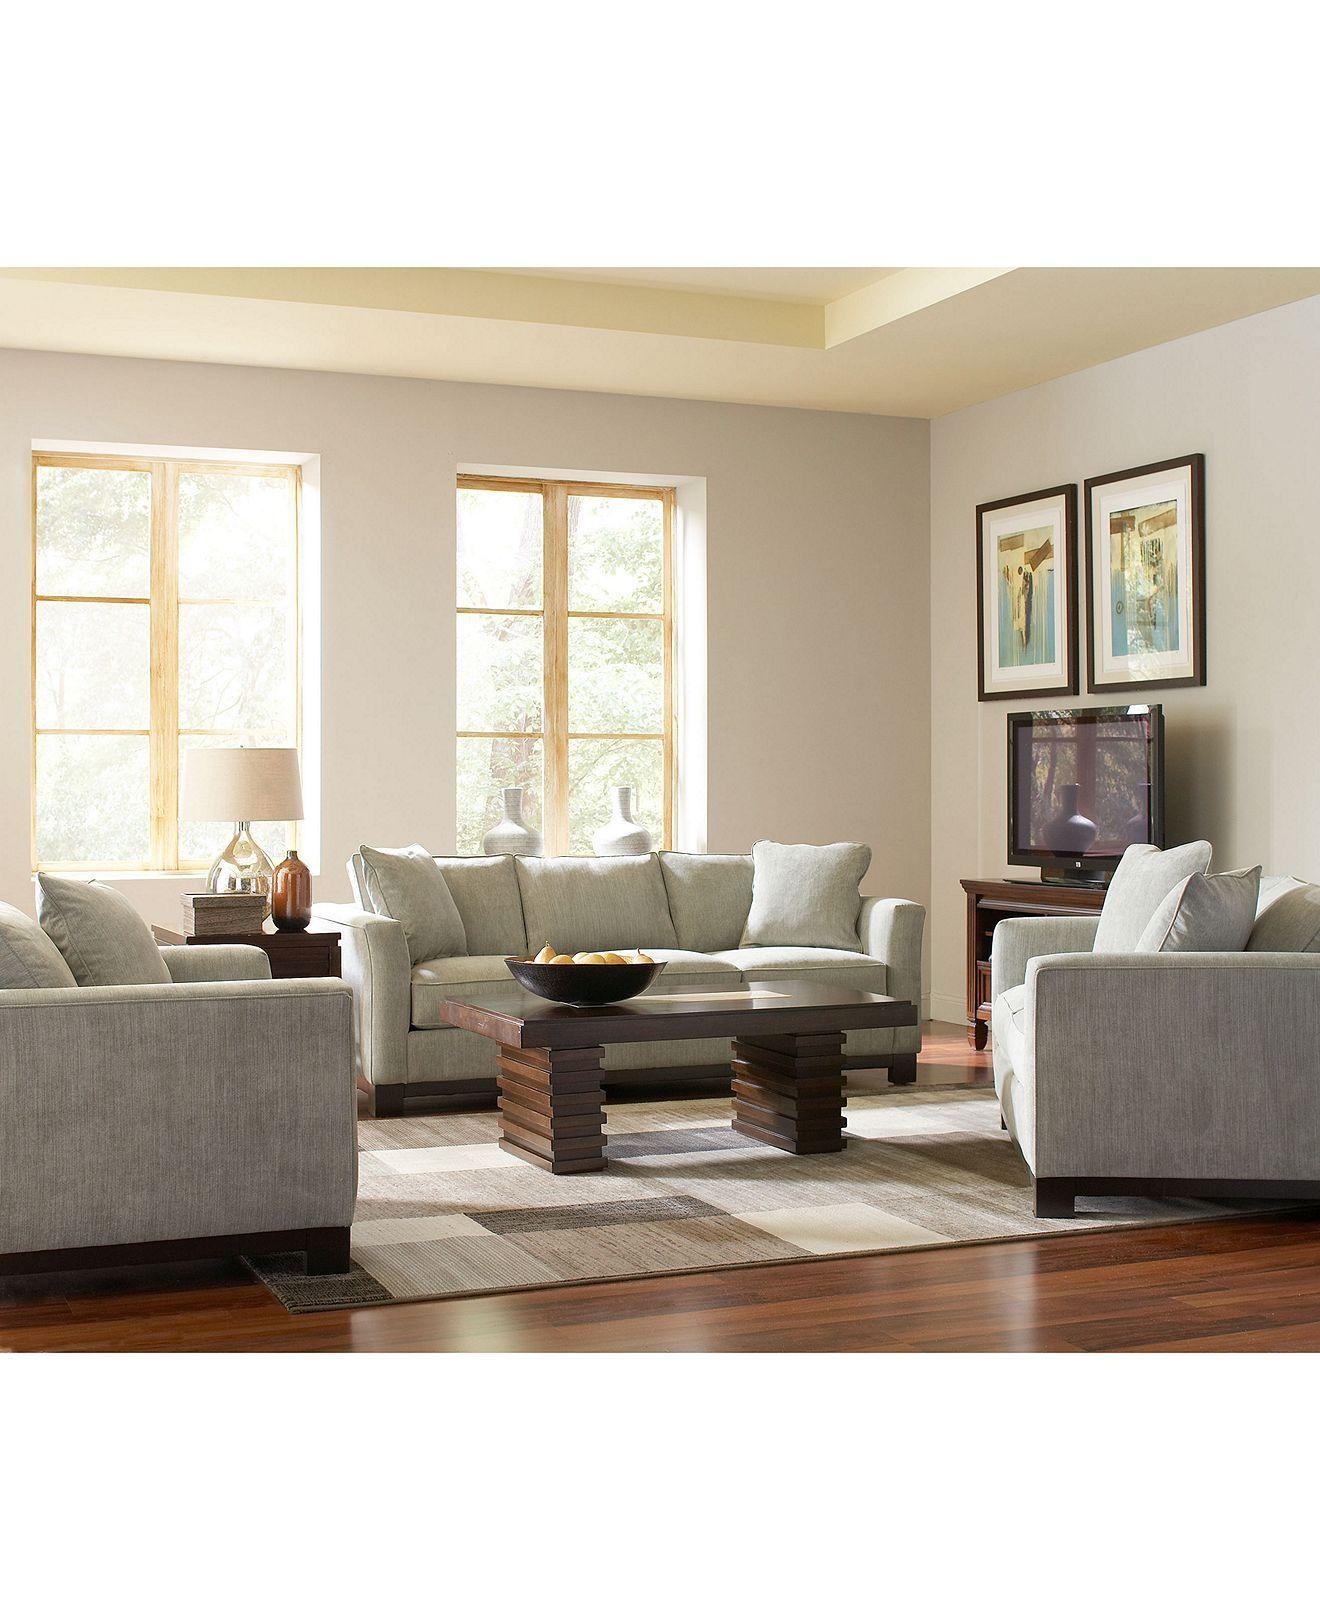 Kenton Fabric Sofa Living Room Furniture Collection Furniture Macy S Living Room Furniture Accent Chairs For Living Room Furniture